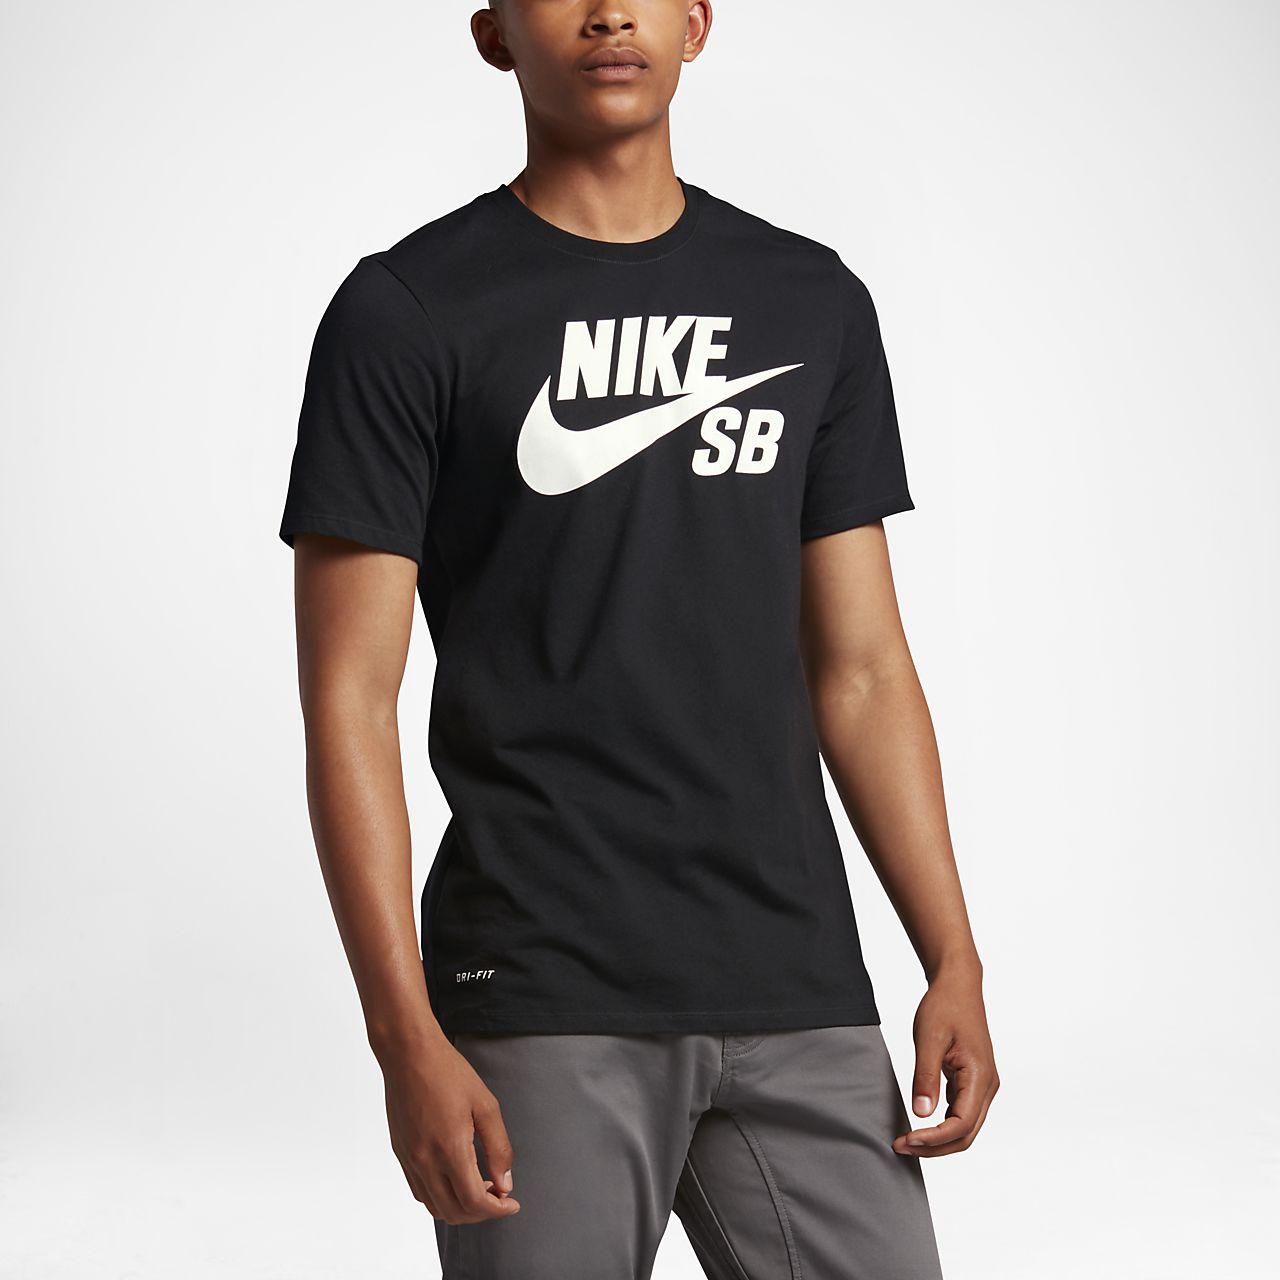 Nike sb logo men 39 s t shirt ma for Dolphins t shirt new logo